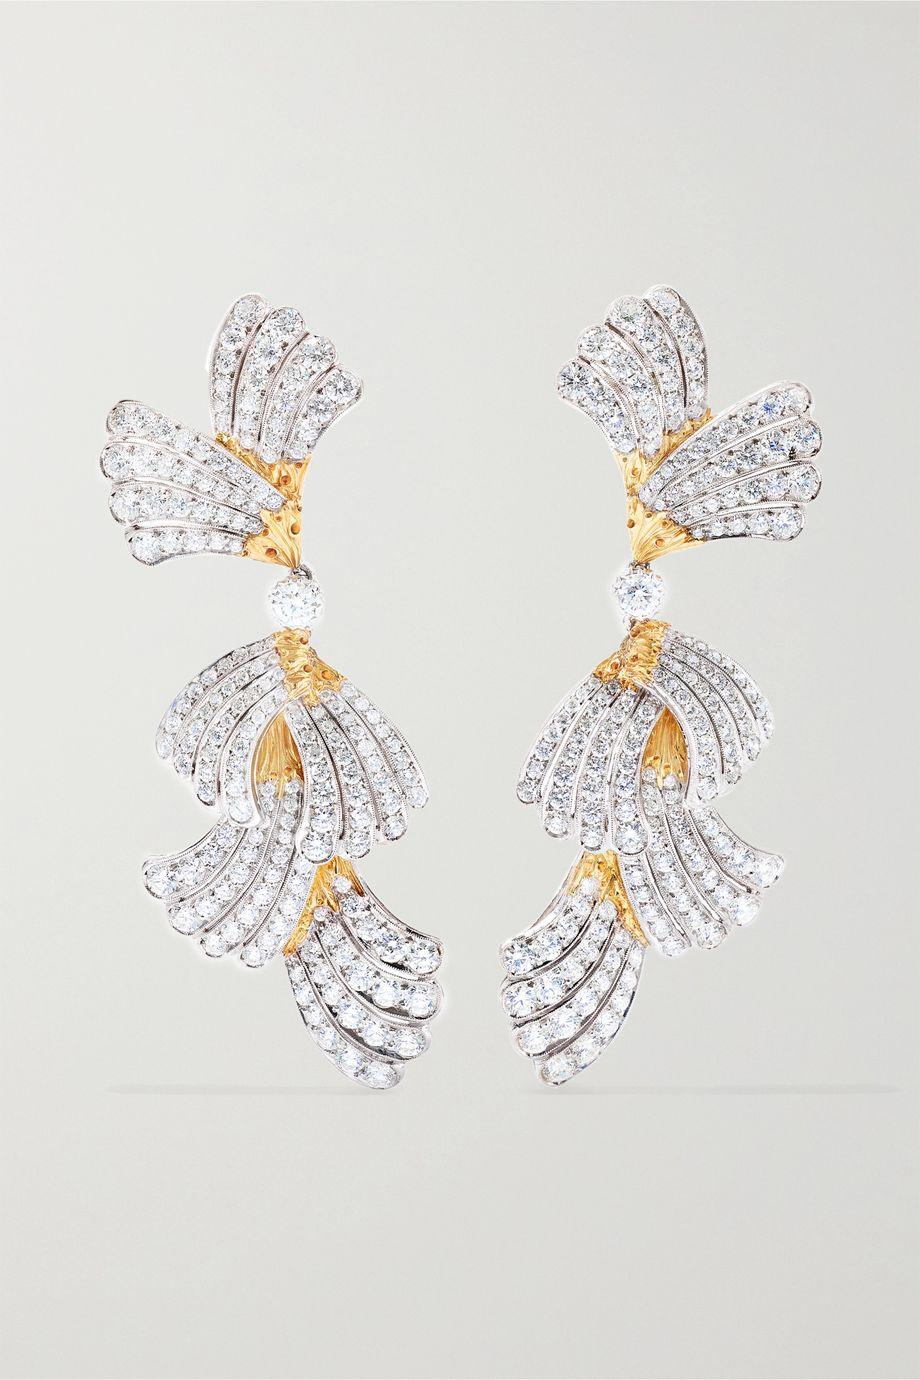 Buccellati 18-karat white and yellow gold diamond earrings